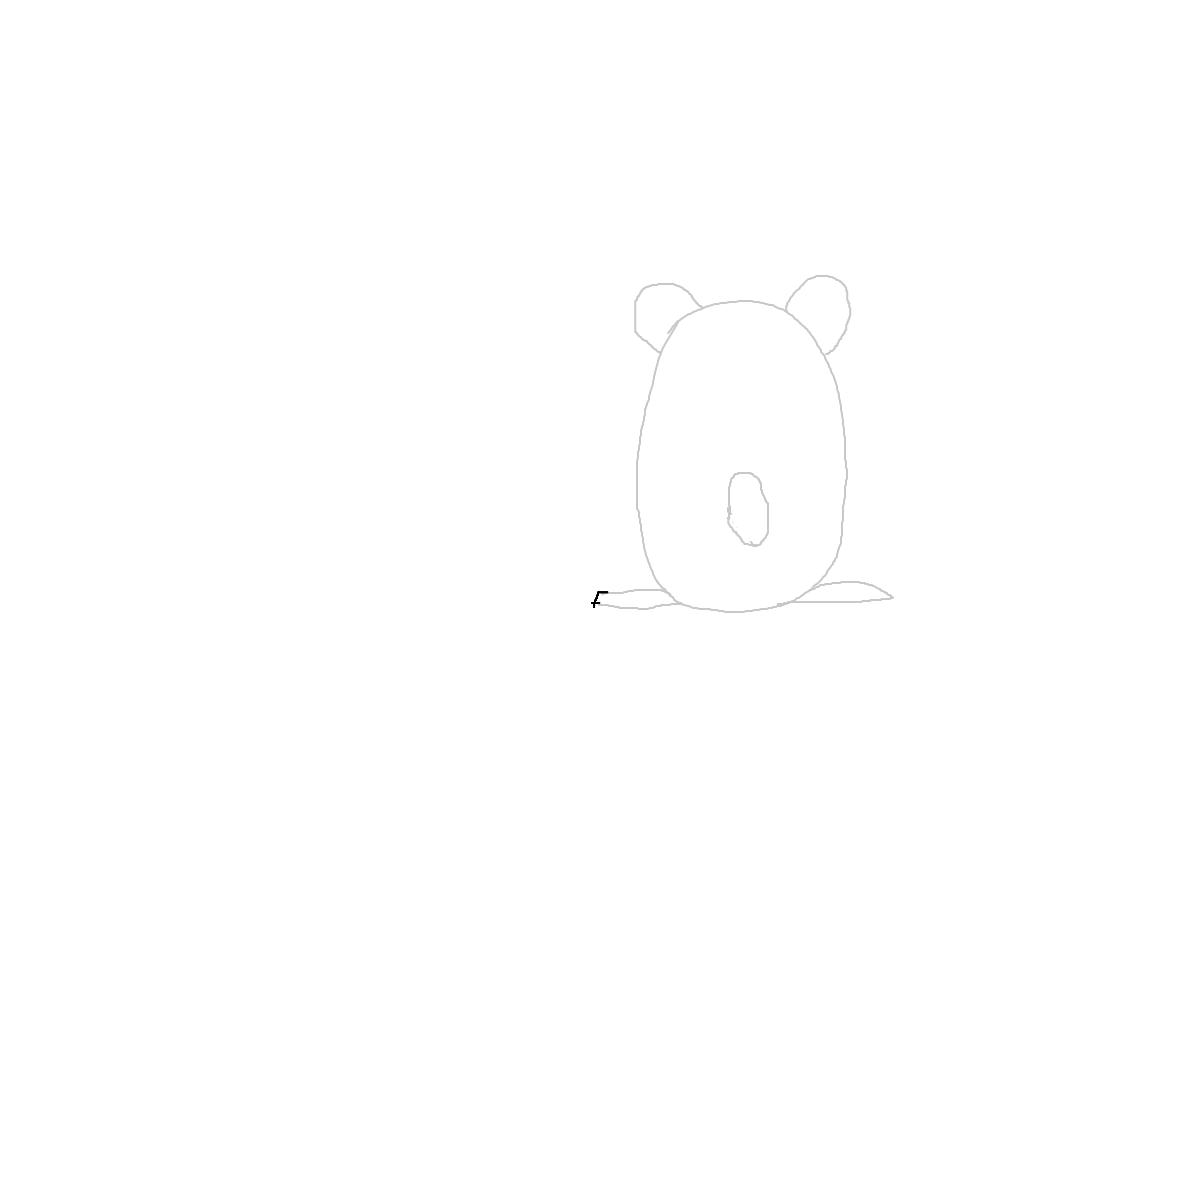 BAAAM drawing#16949 lat:51.2066726684570300lng: 3.2593386173248290